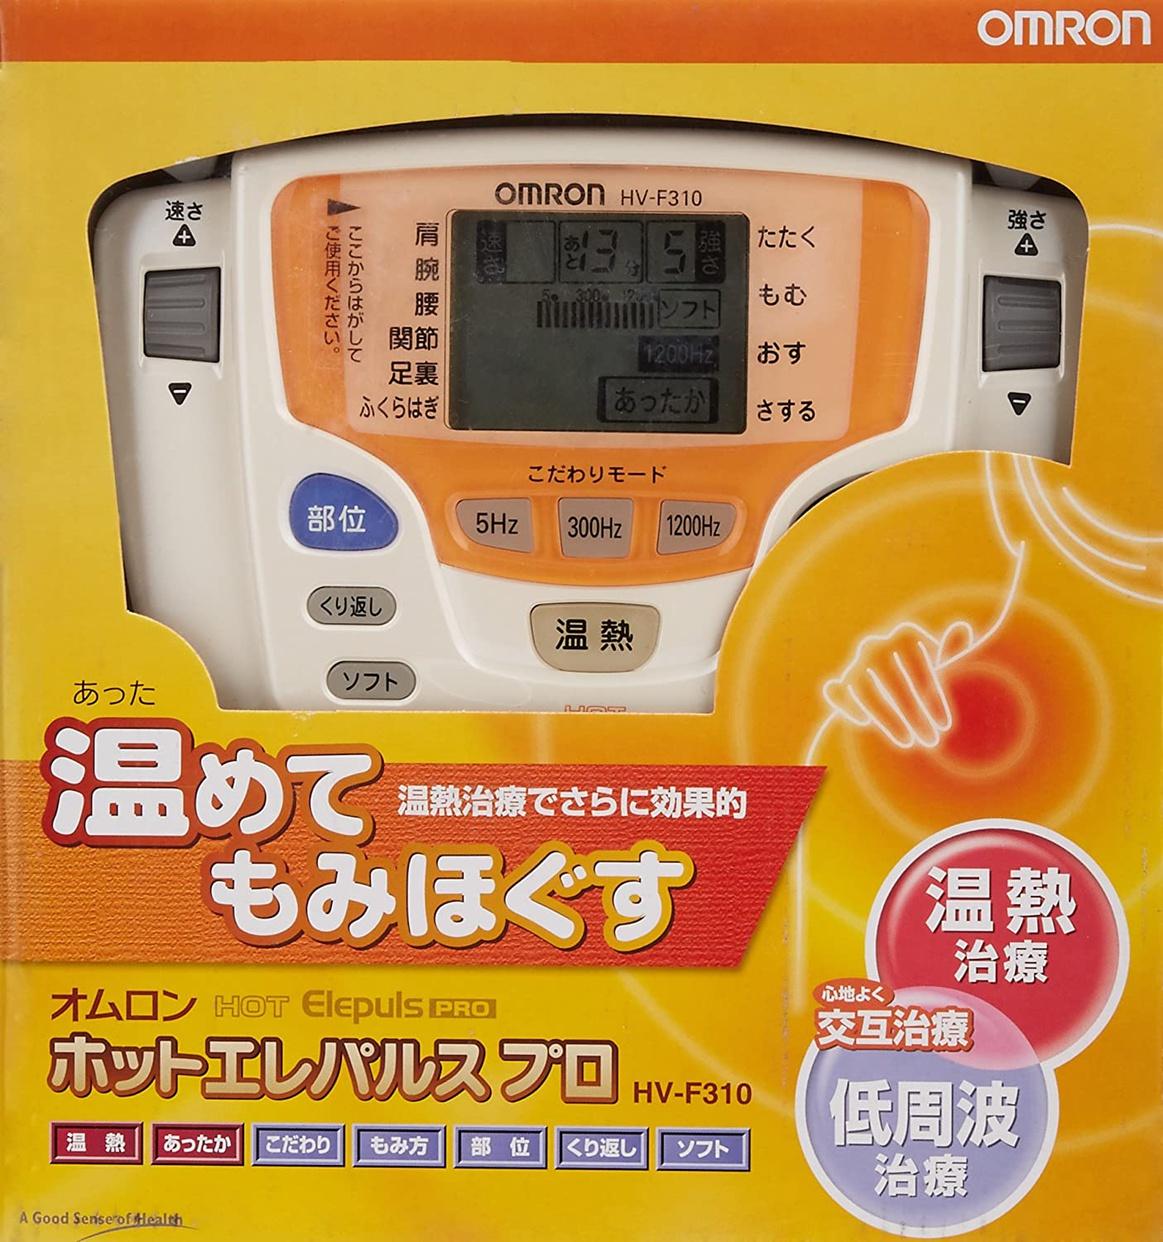 OMRON(オムロン) 低周波治療器 ホットエレパルス プロ HV-F310の商品画像4